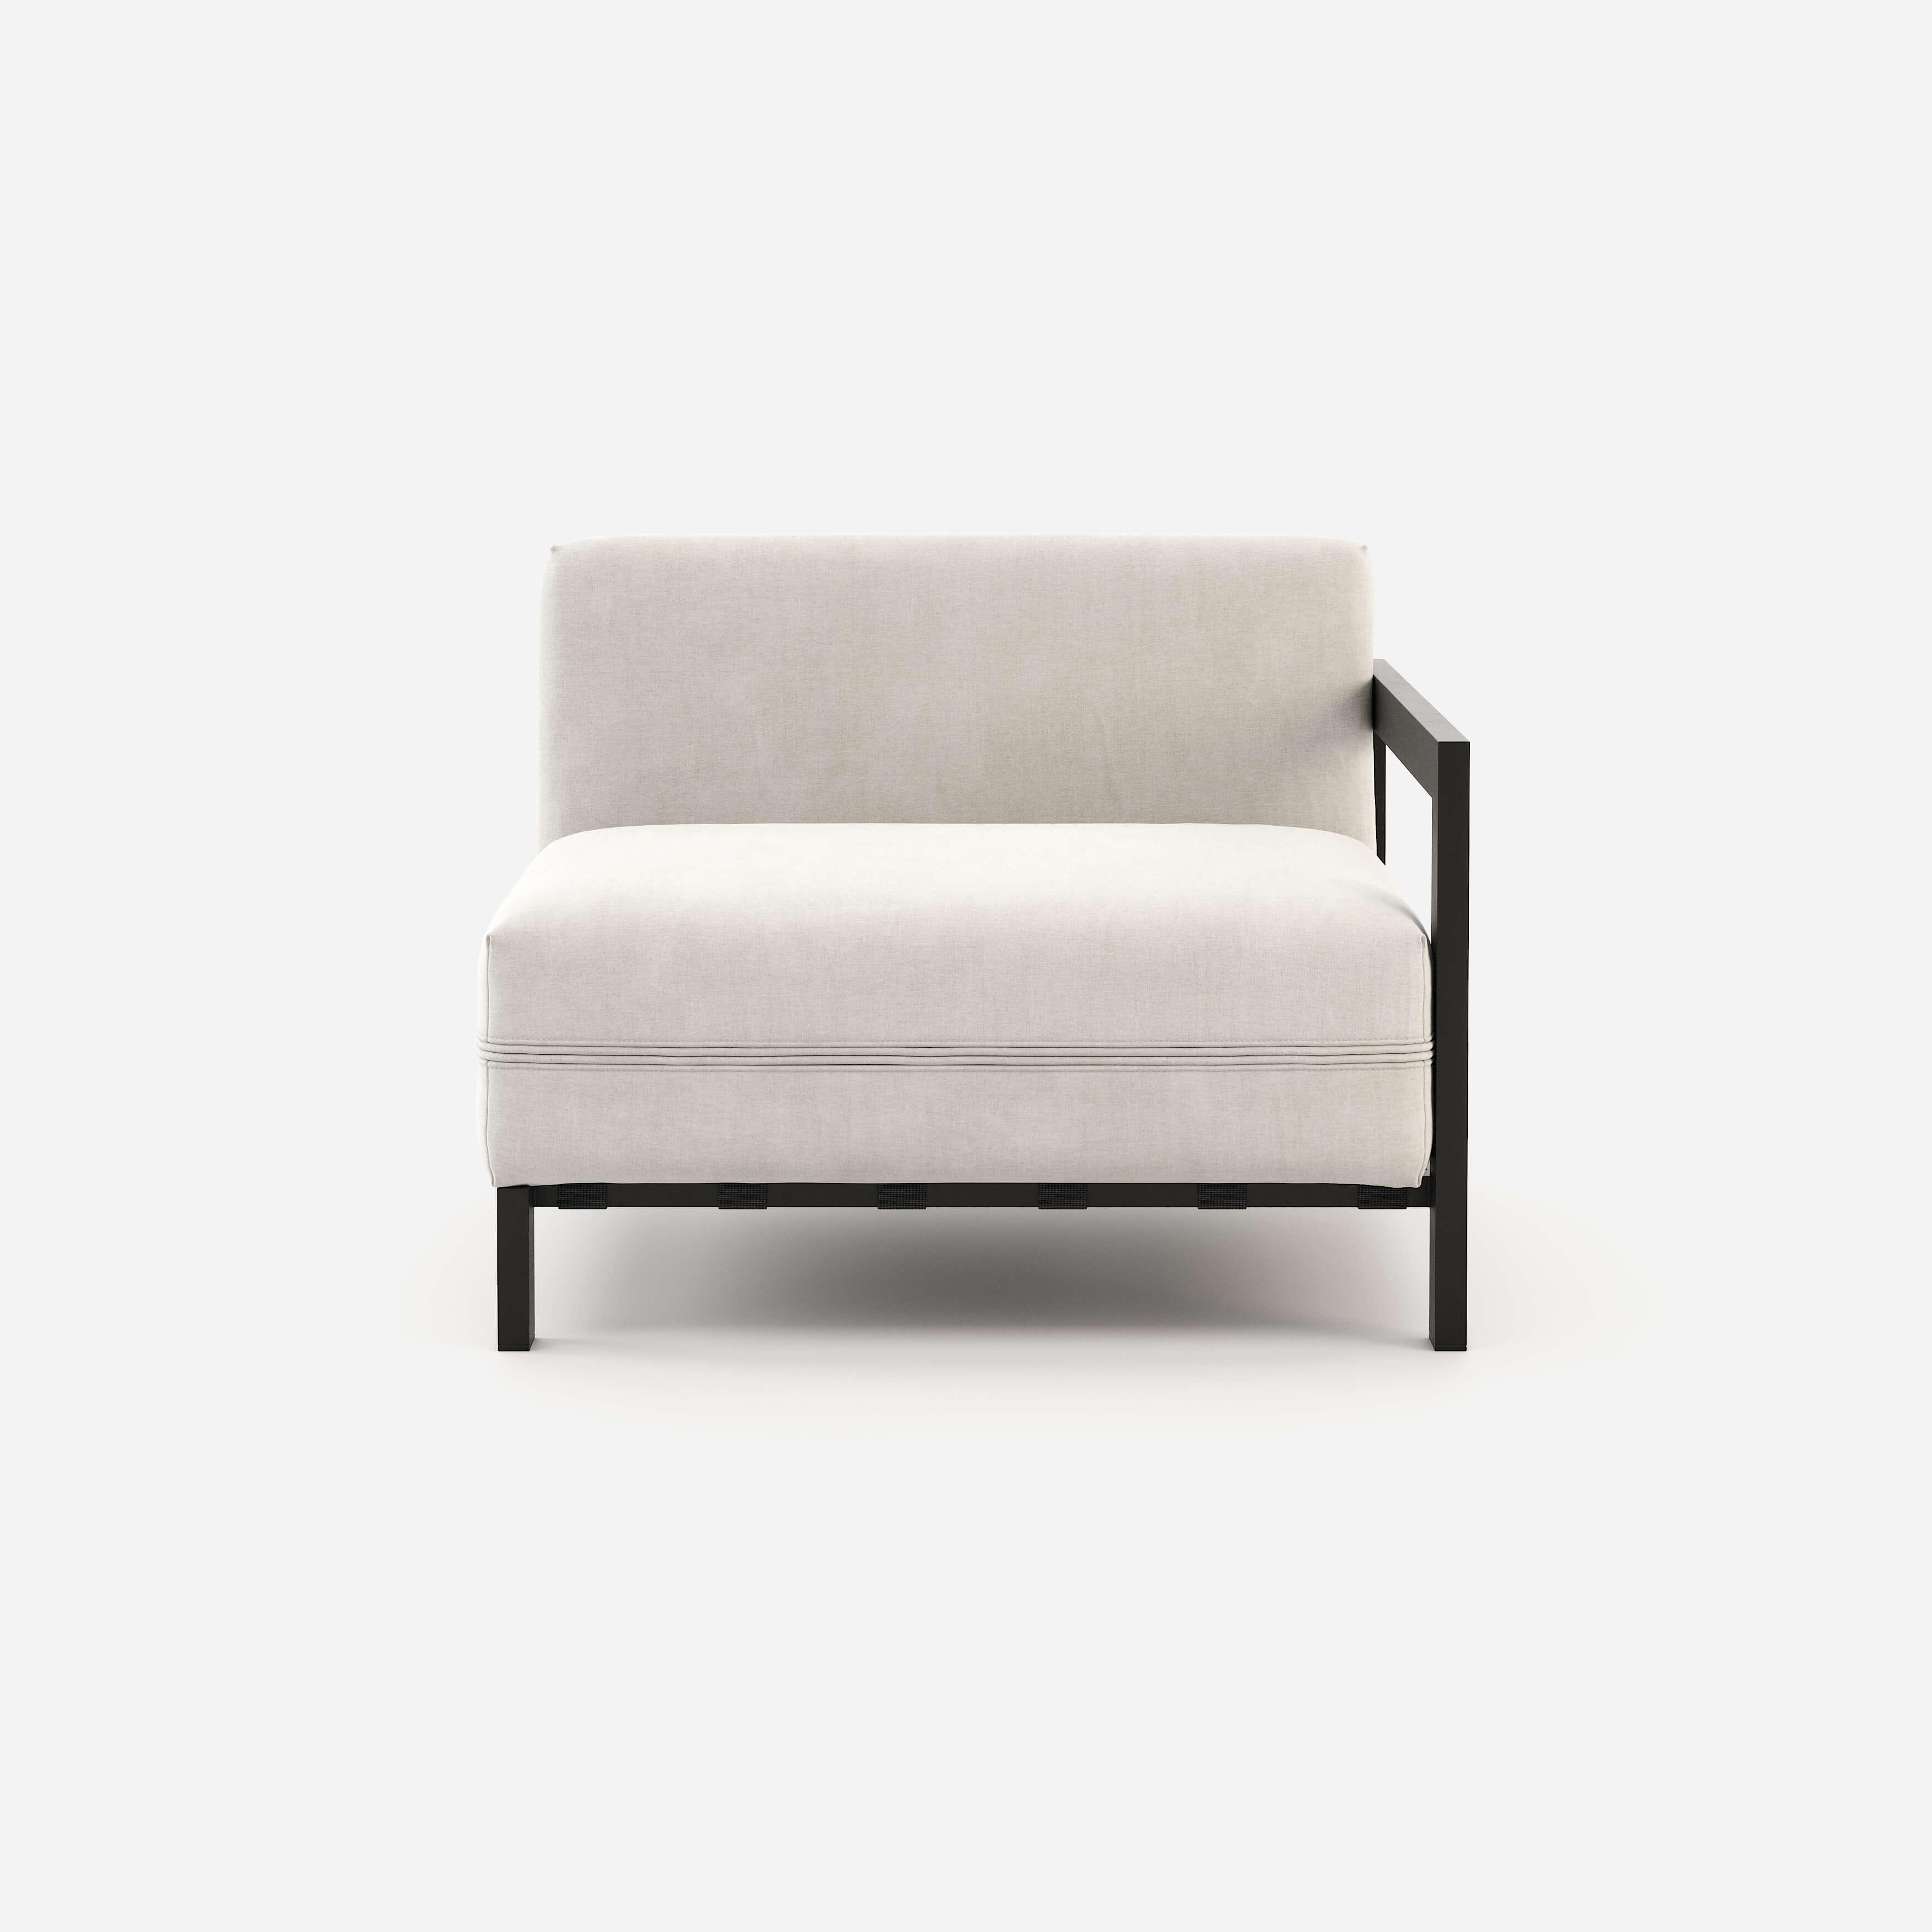 Bondi Right Armrest-domkapa-outdoor-collection-interior-design-home-decor-white-furniture-2